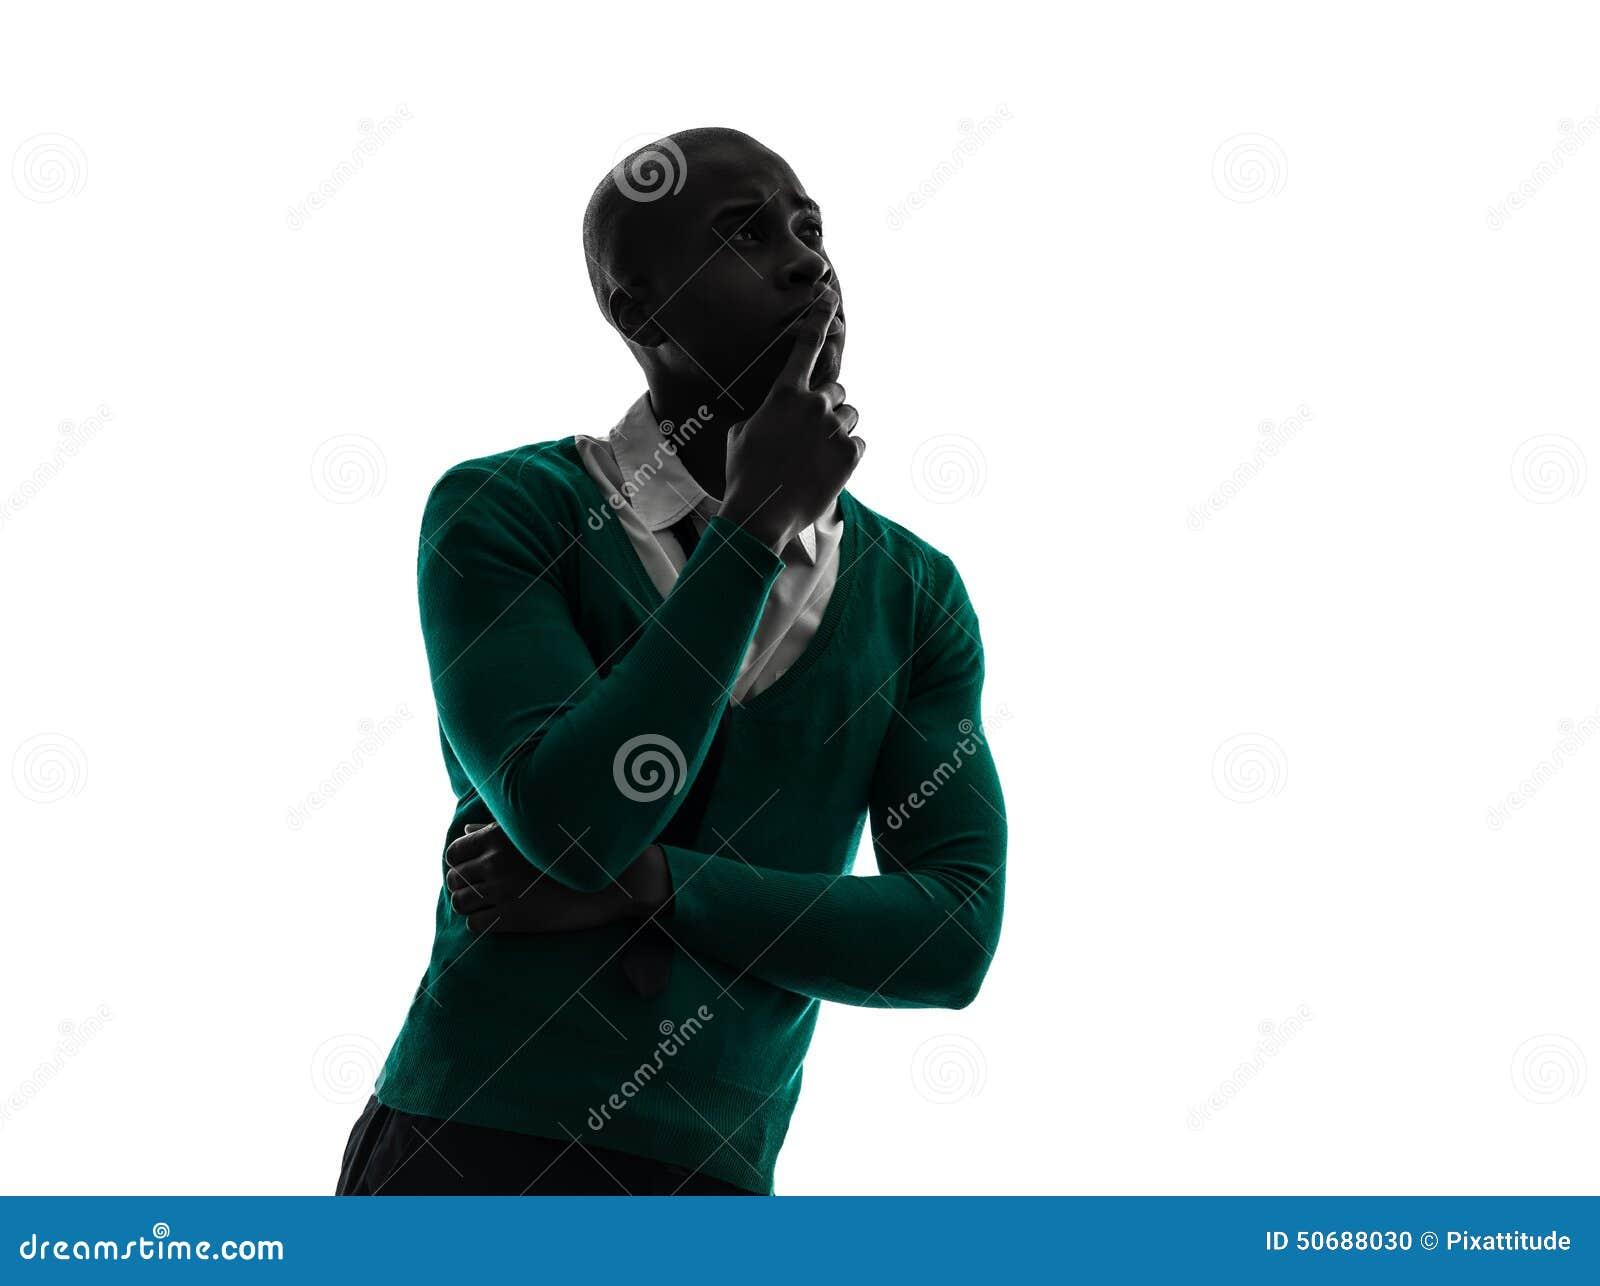 Download 认为沉思剪影的非洲黑人 库存照片. 图片 包括有 背包, 沉思, 工作室, 影子, 破擦声, 查出, 纵向 - 50688030